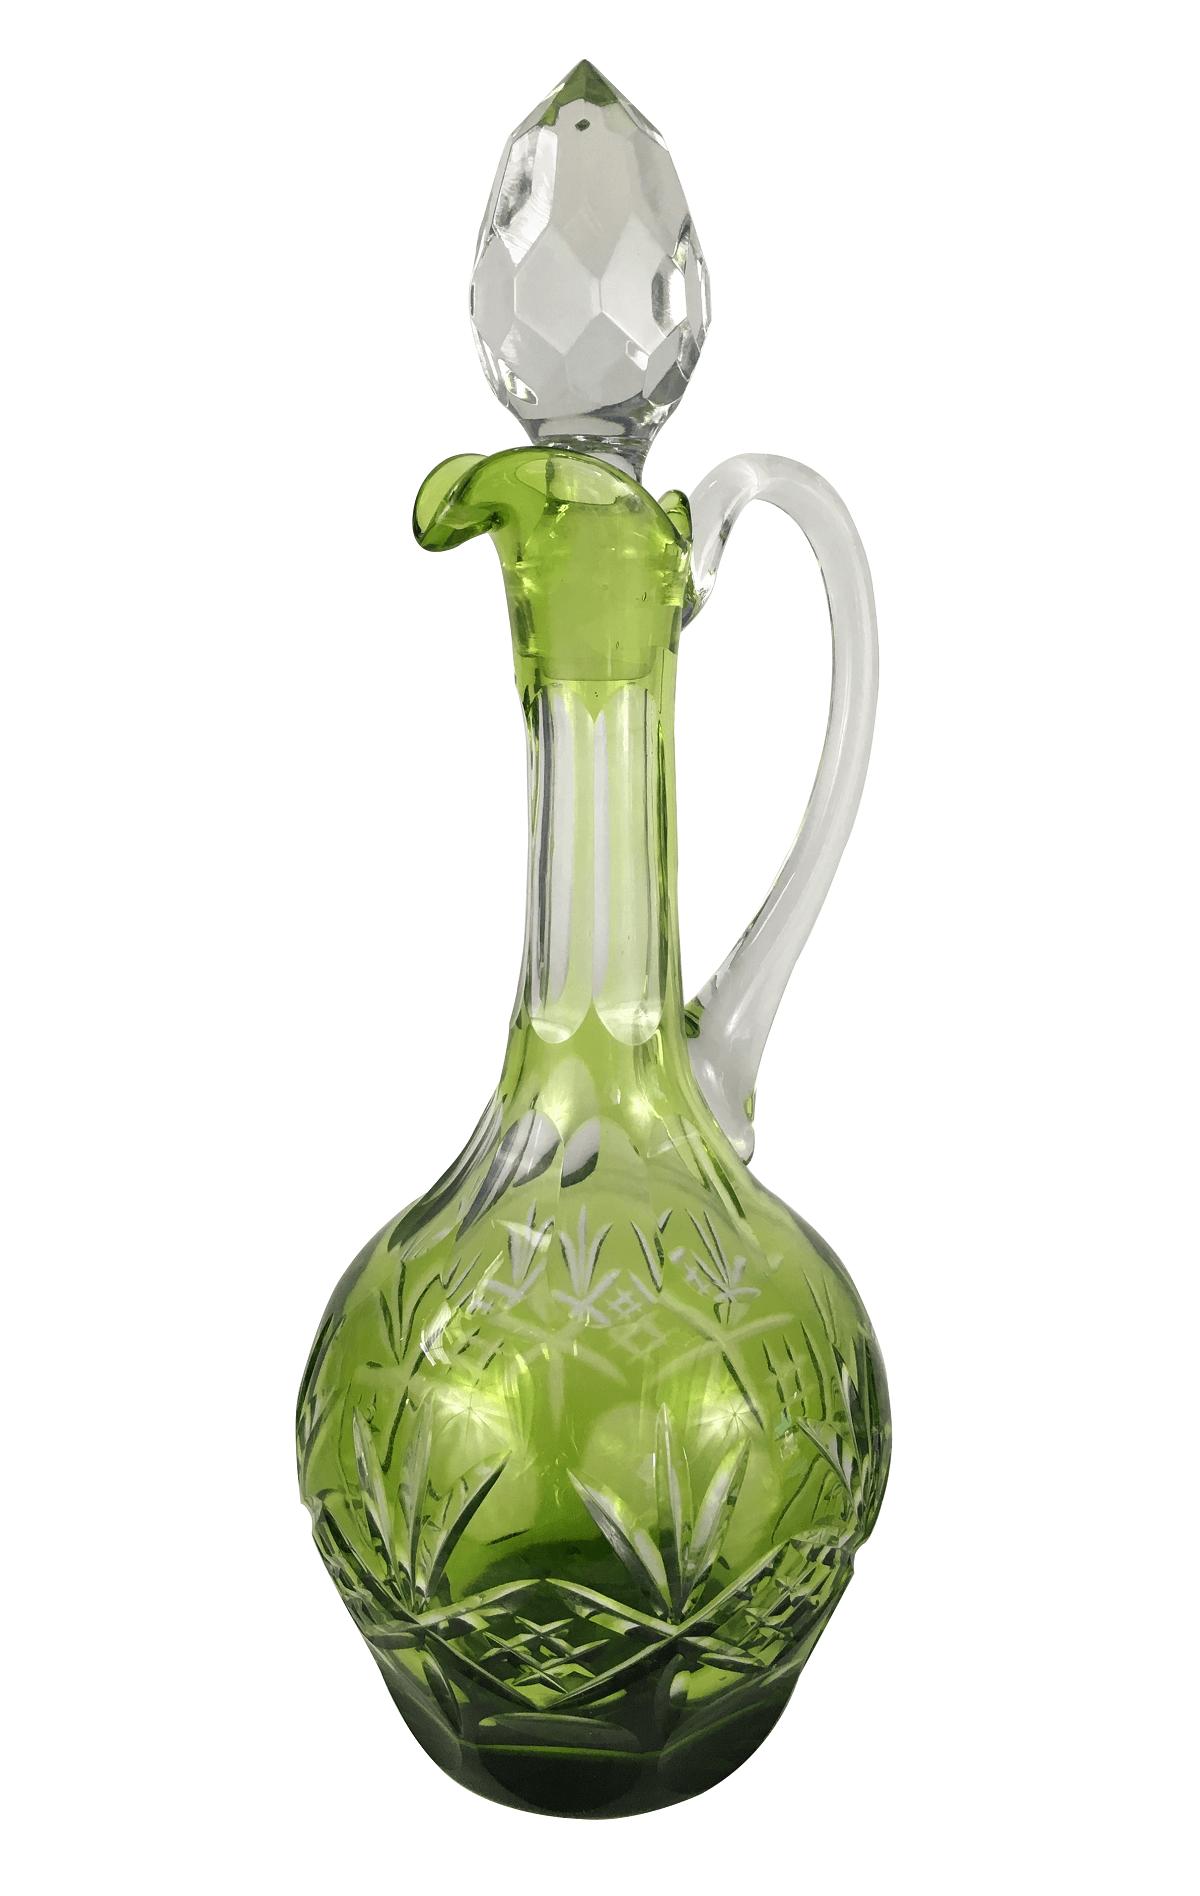 Espetacular Garrafa Licoreira Cristal Verde Provavelmente Baccarat